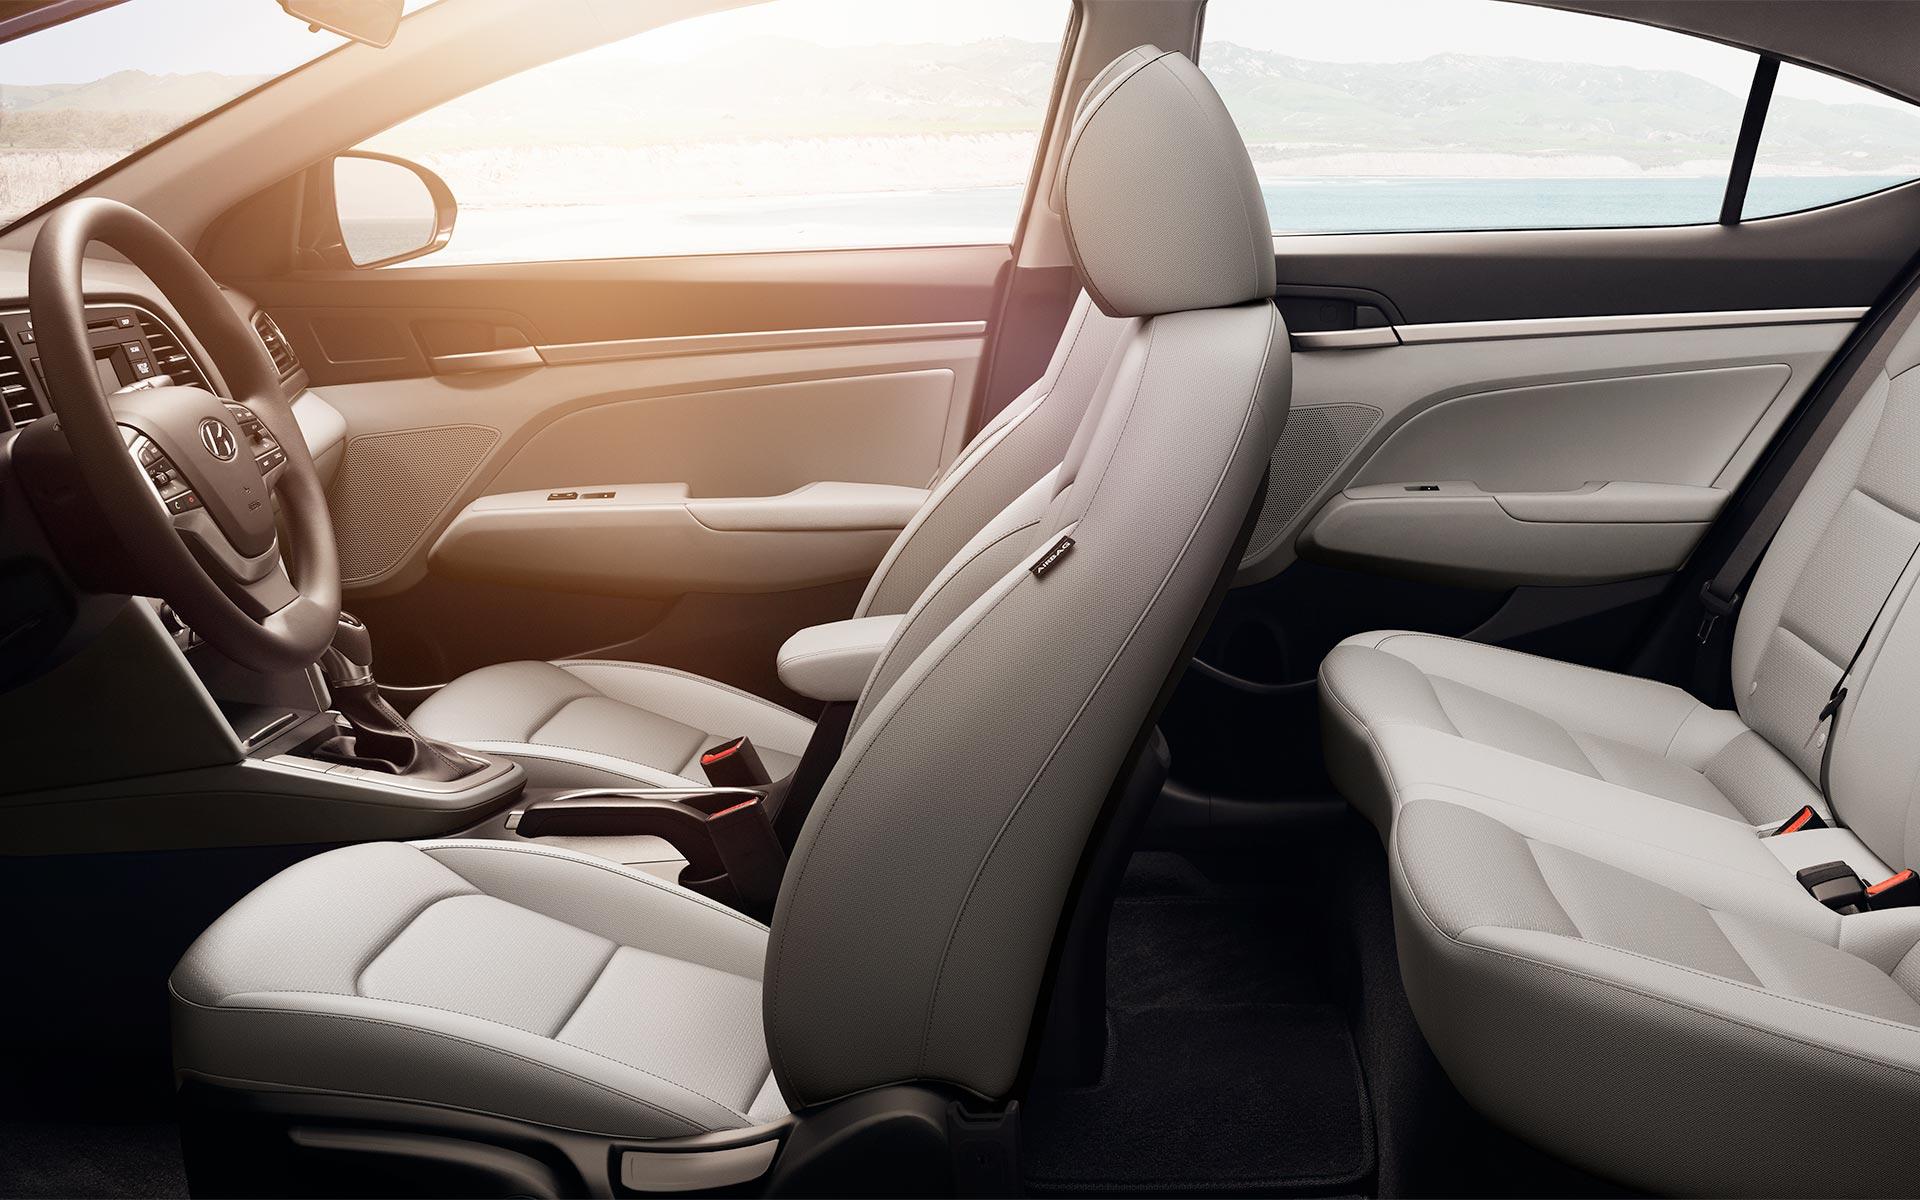 2018 Hyundai Elantra Interior